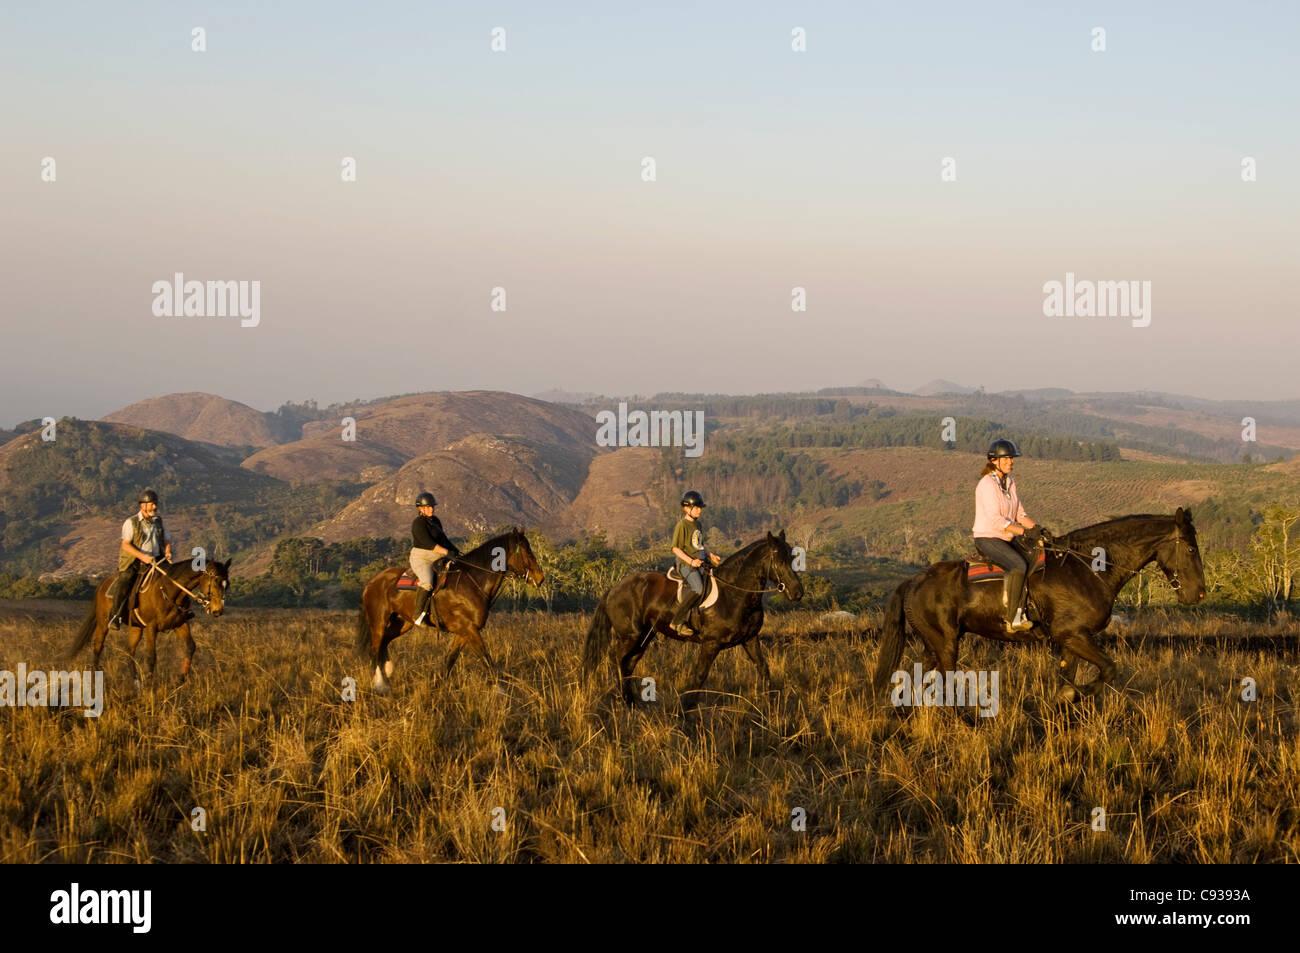 Malawi, Zomba Plateau.  Ein Pferd Reiten Safari ist ein beliebter Weg, Zomba Plateau zu erkunden. Stockfoto